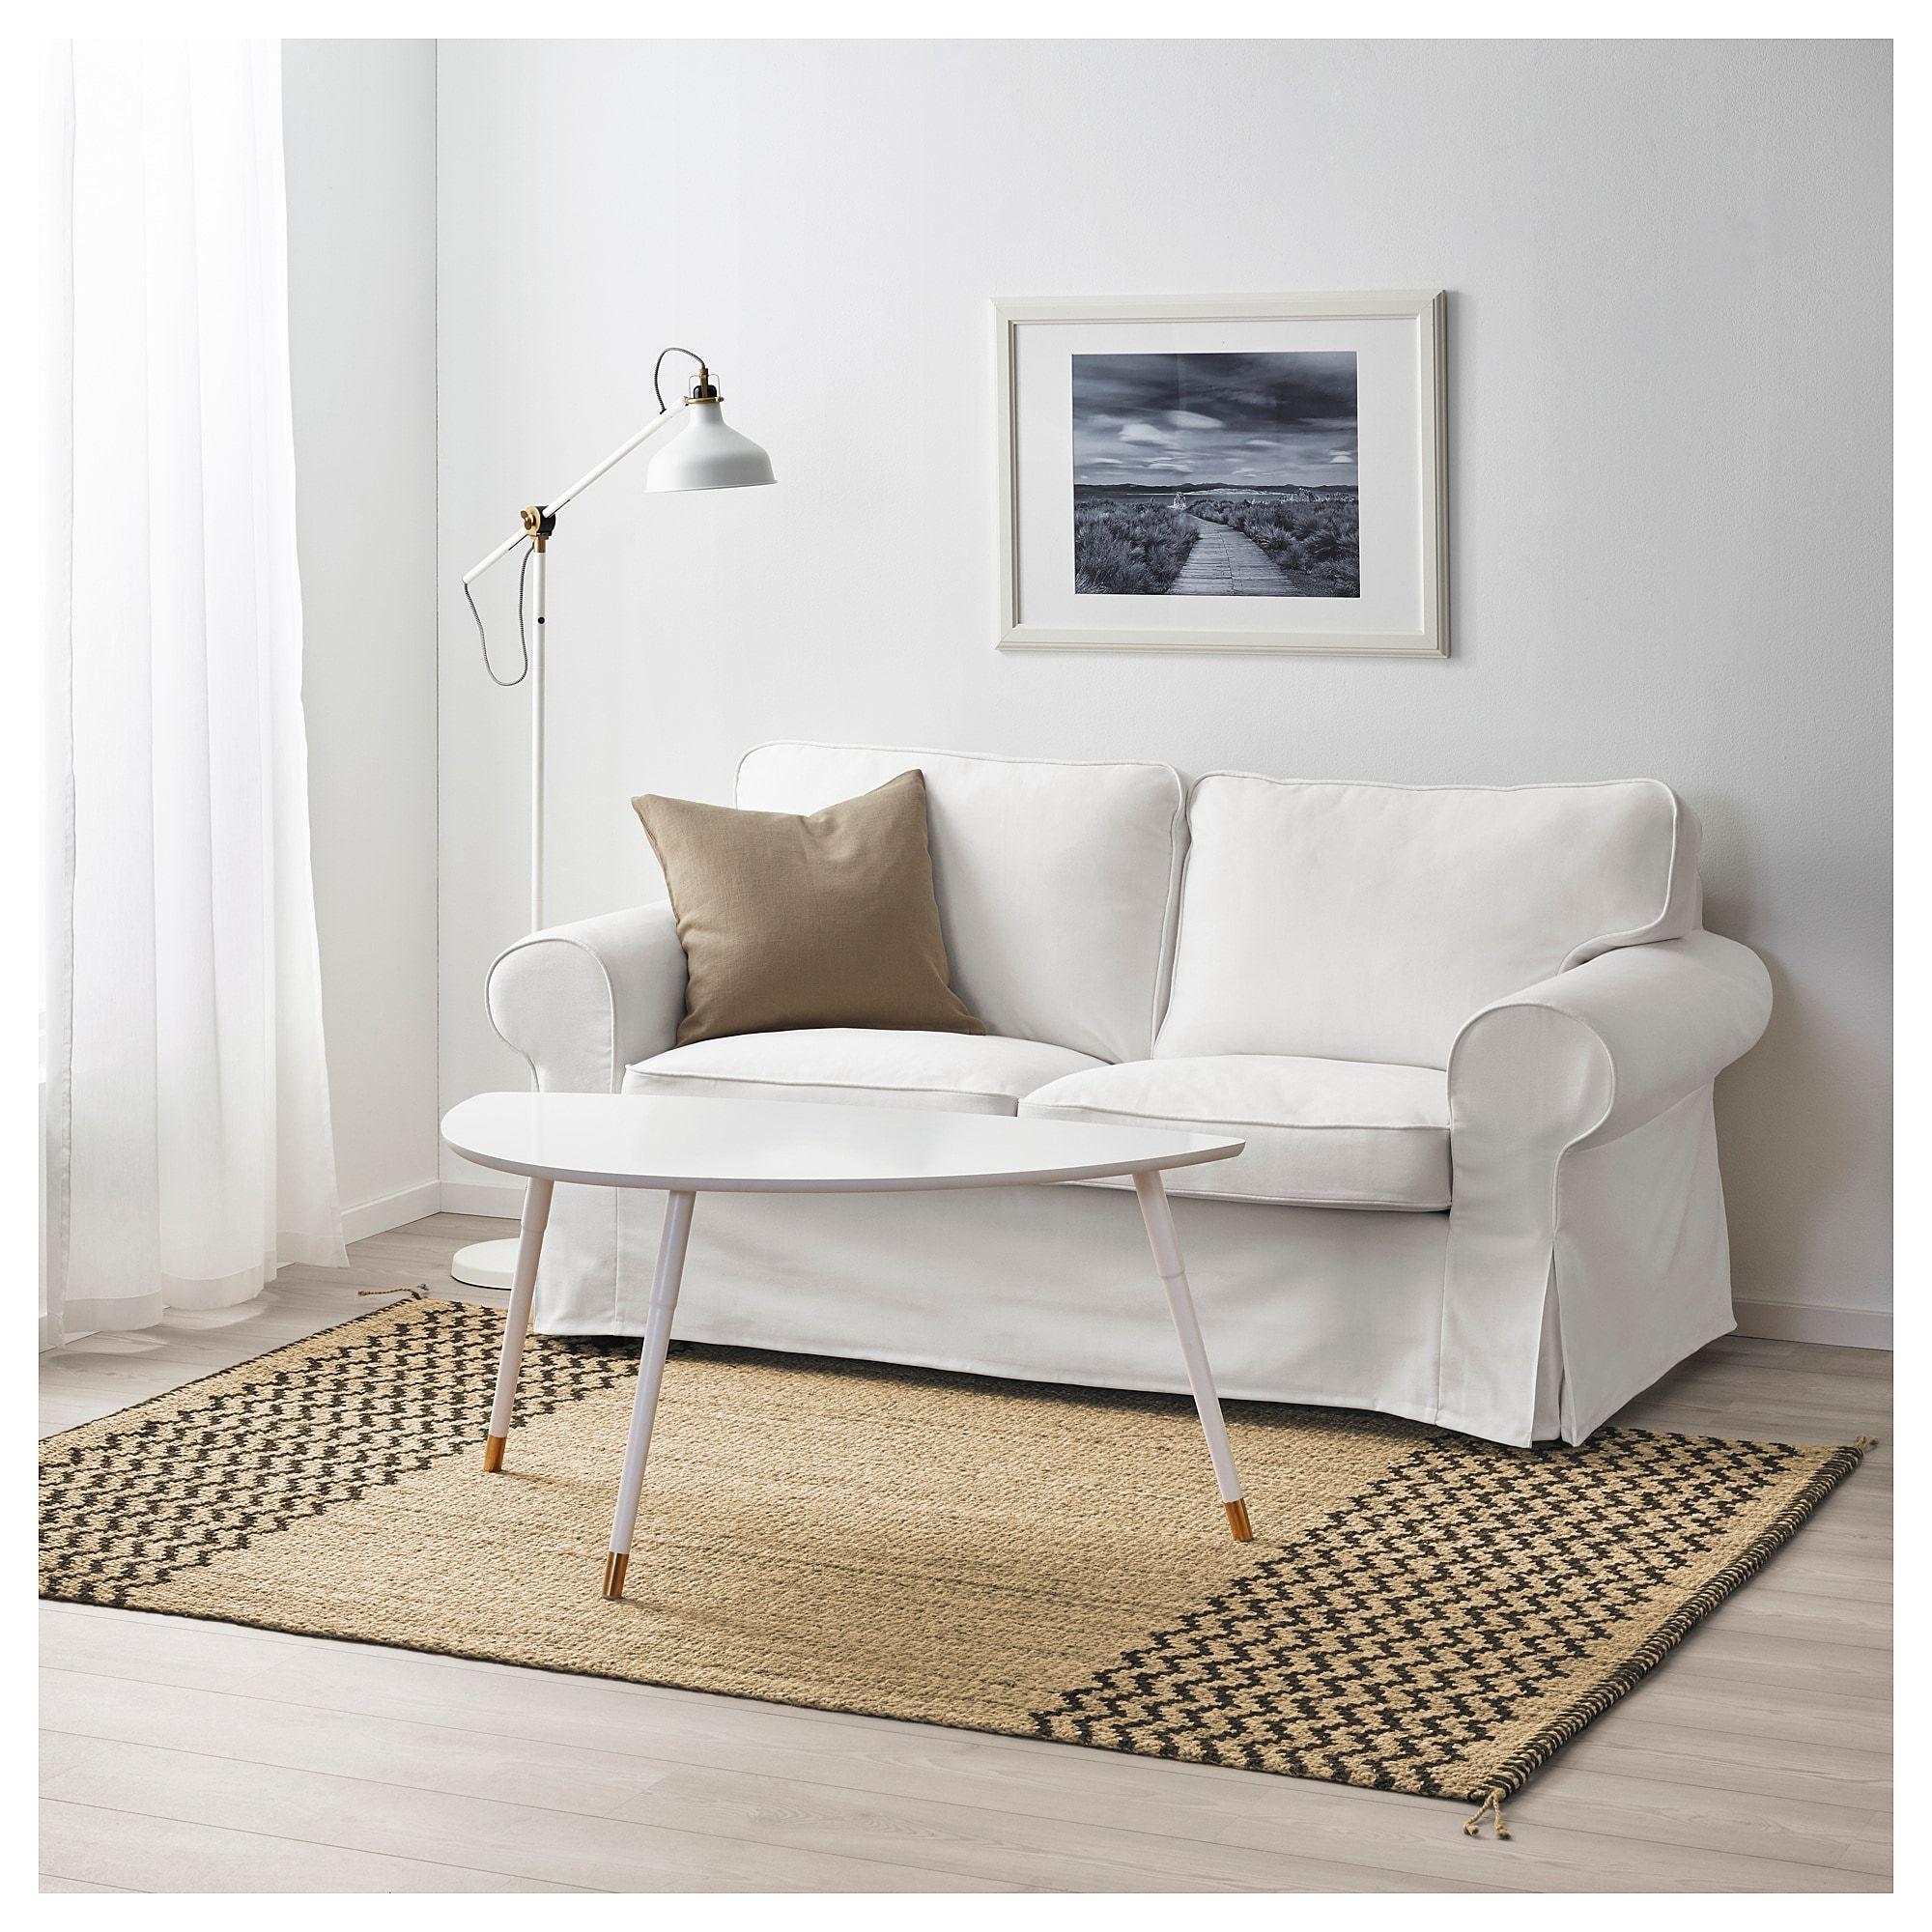 Lavare Tappeto Lana Ikea lÖnholt tappeto, tessitura piatta - naturale, marrone scuro